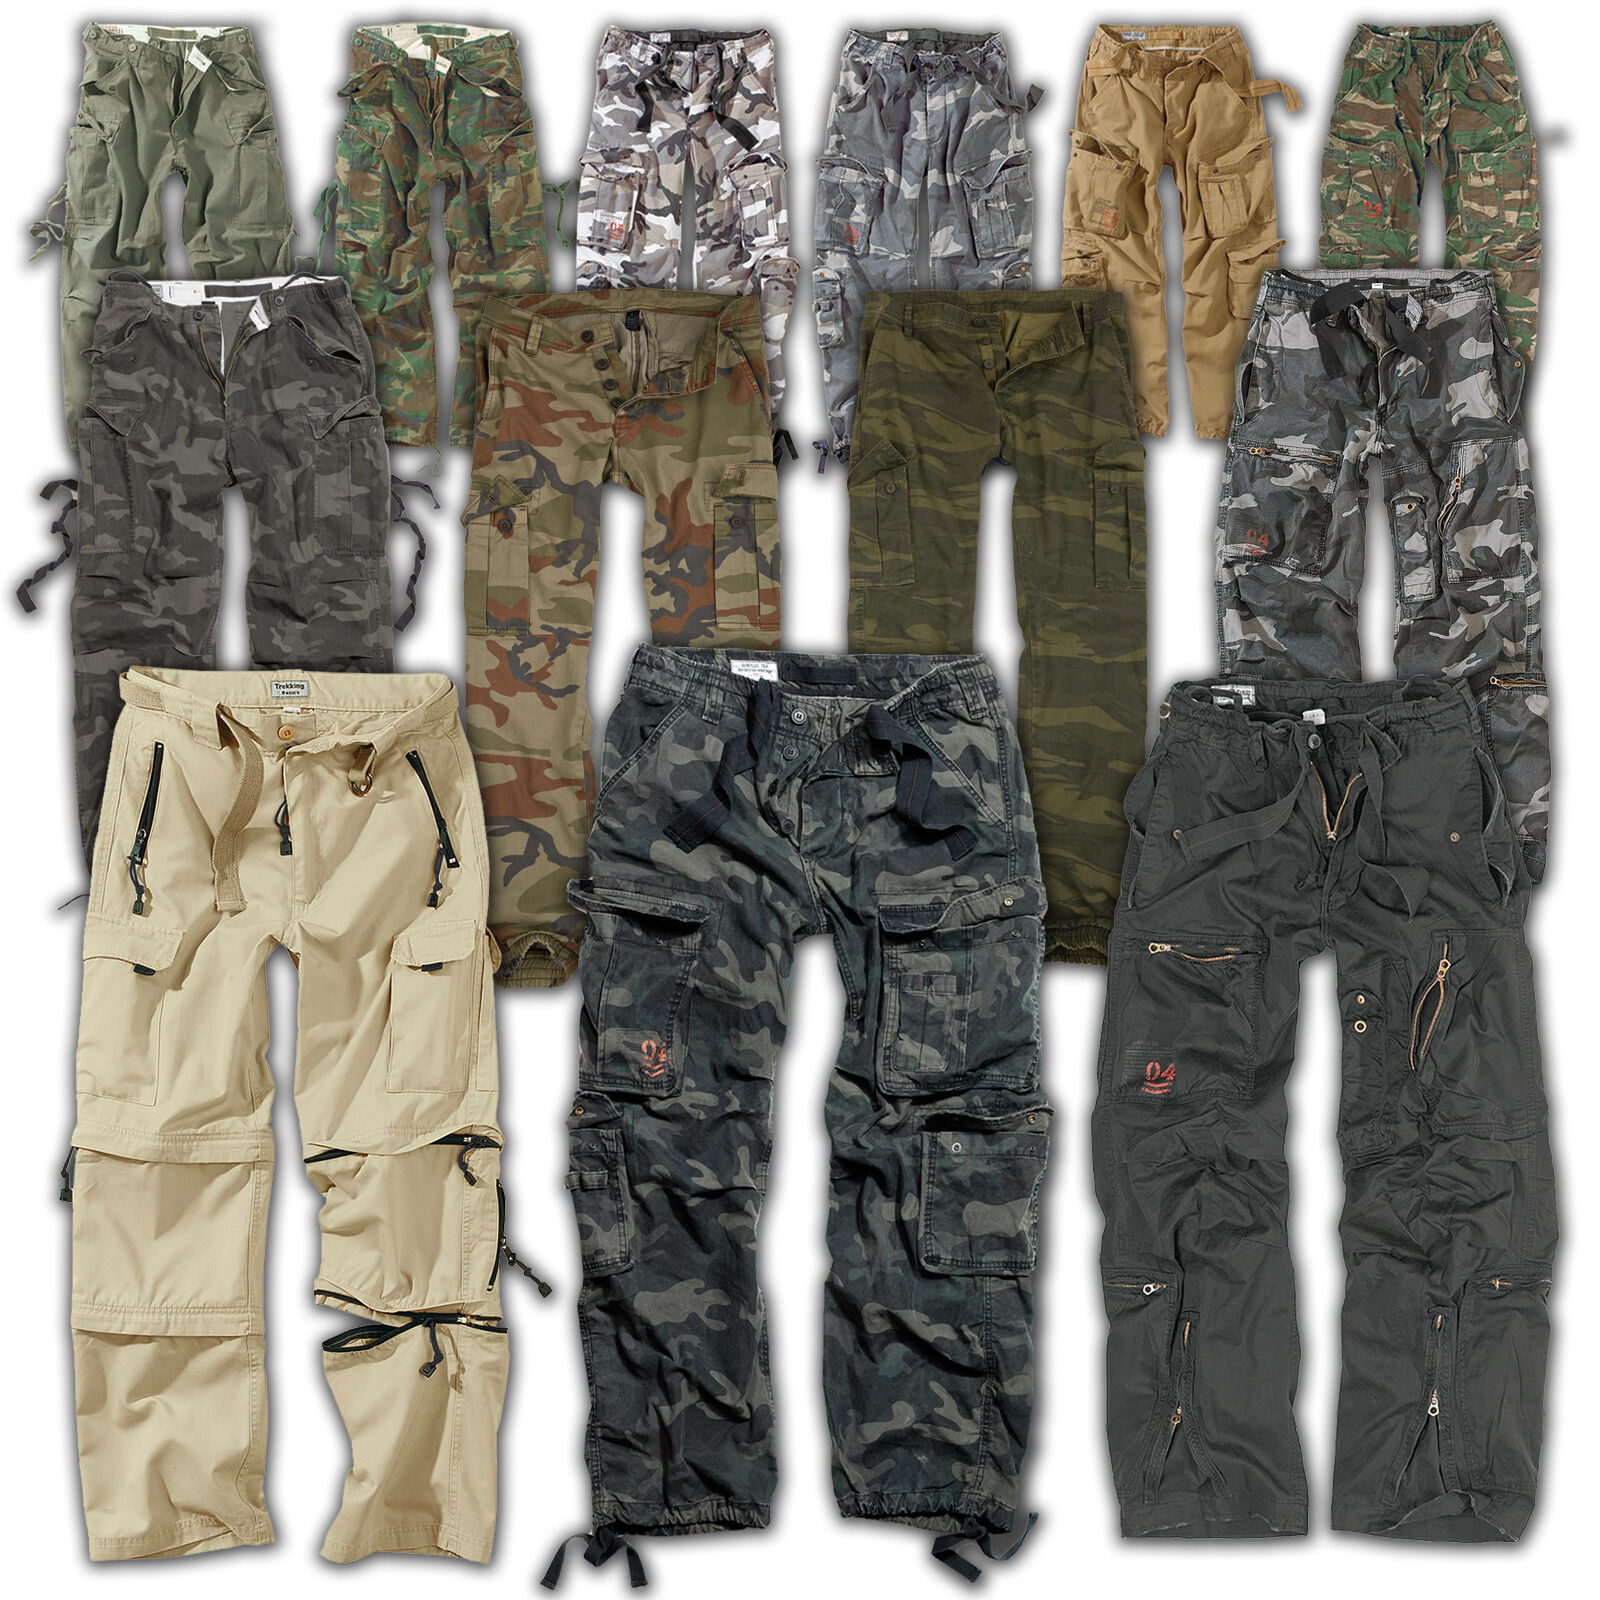 SURPLUS™ Raw Vintage  AIRBORNE  FATIGUES  TREKKING Cargo Hose US Military Pants